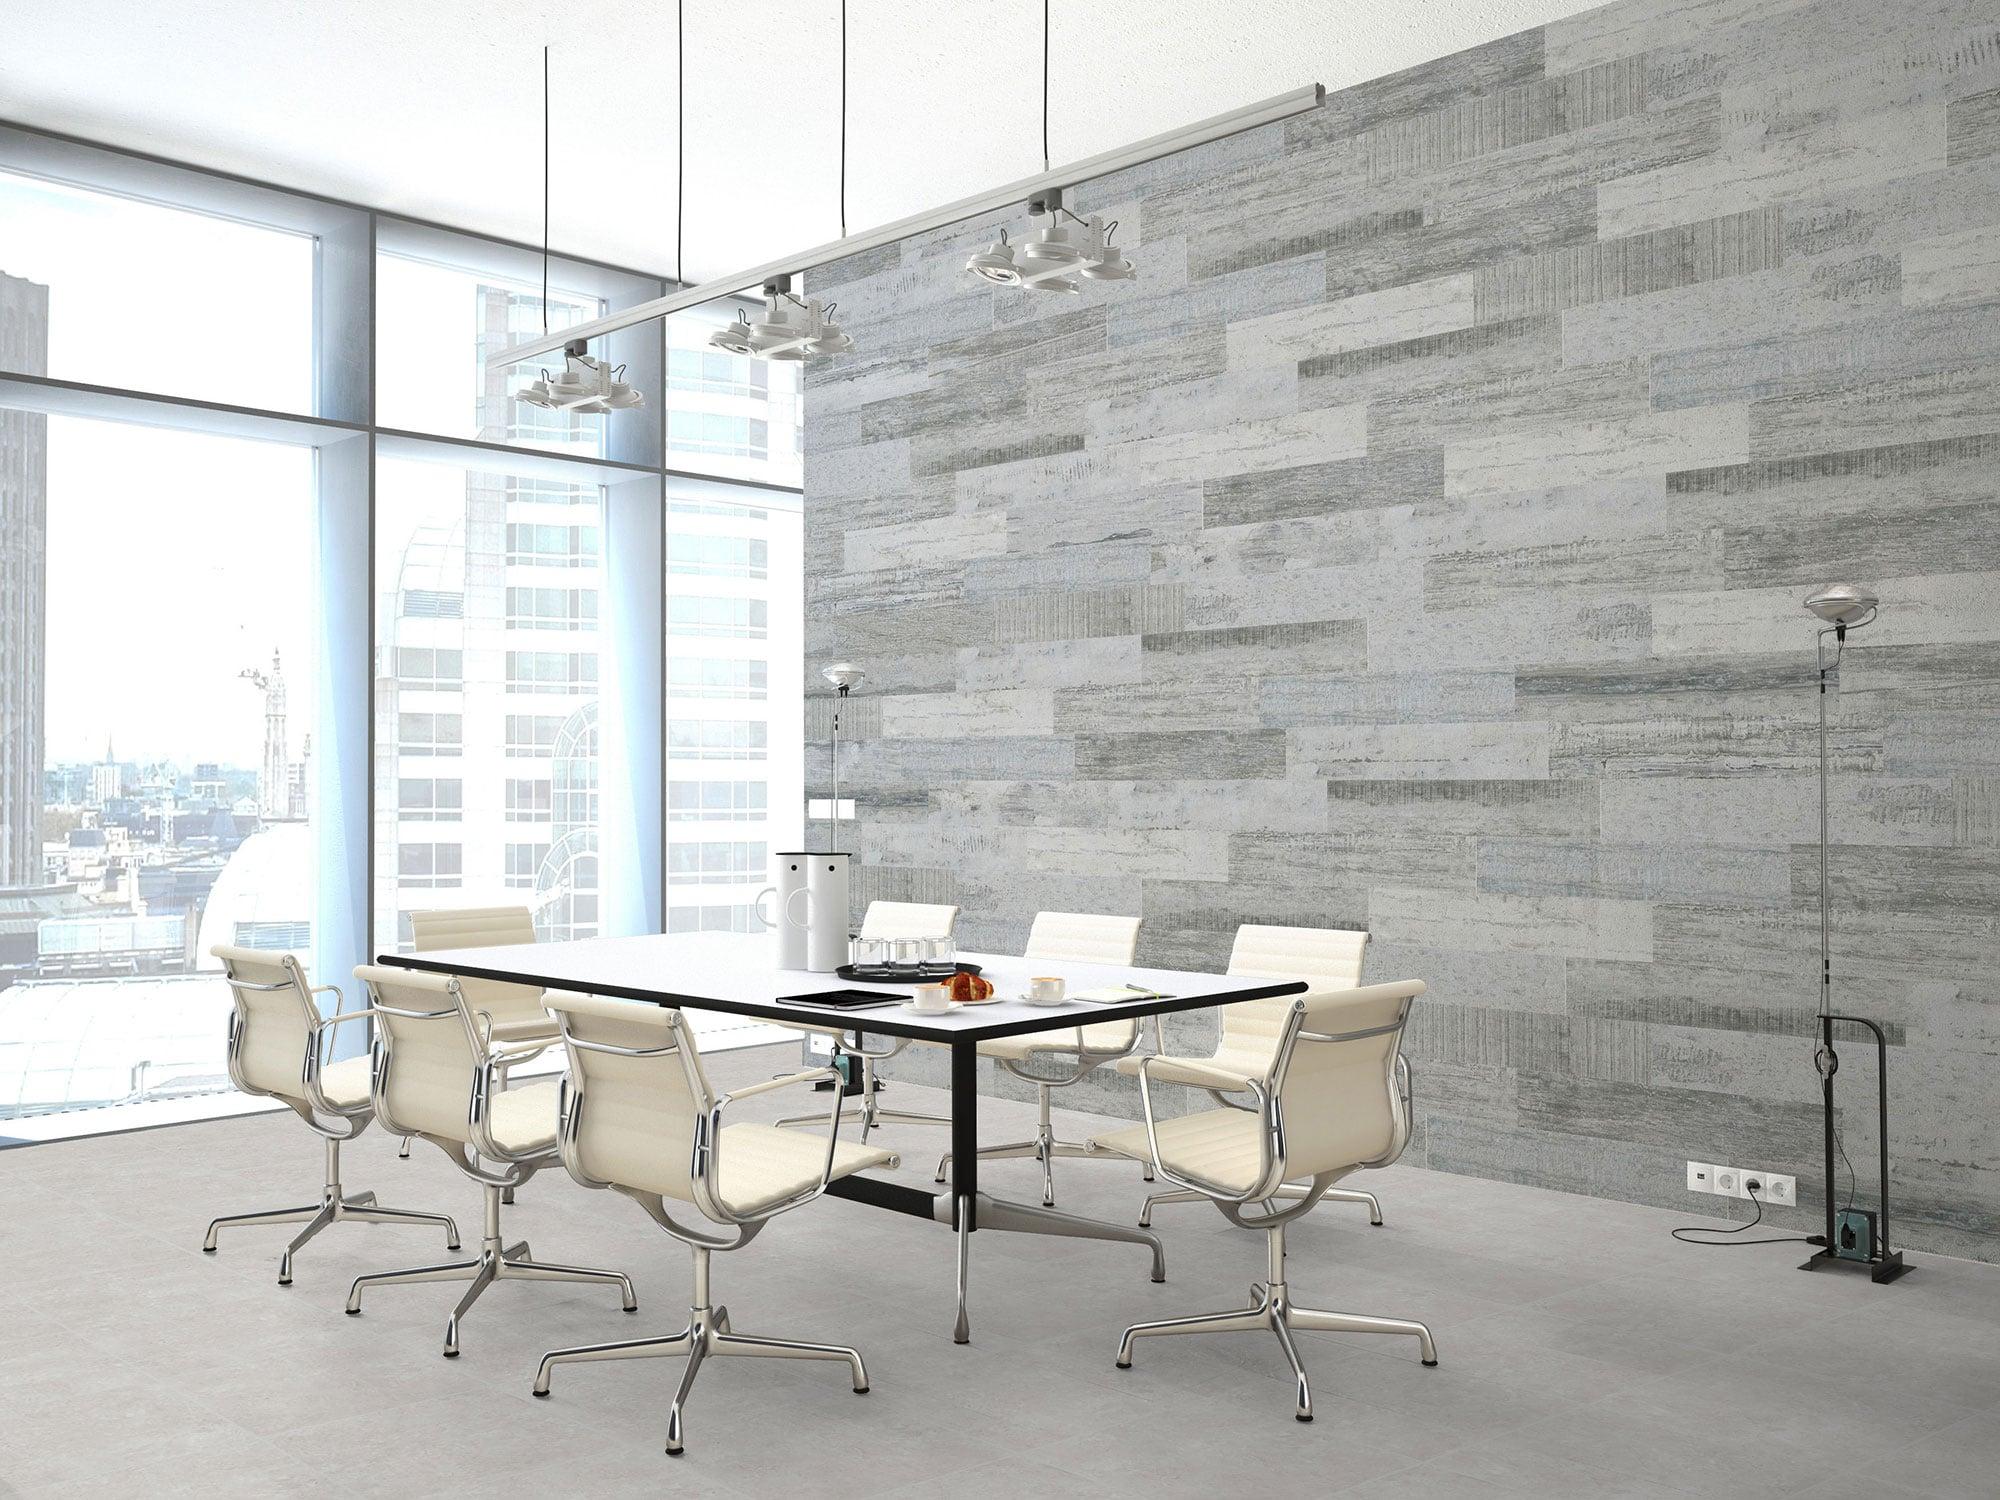 Old Wood Gris · 20 x 114 + Project Perla · 60 x 60